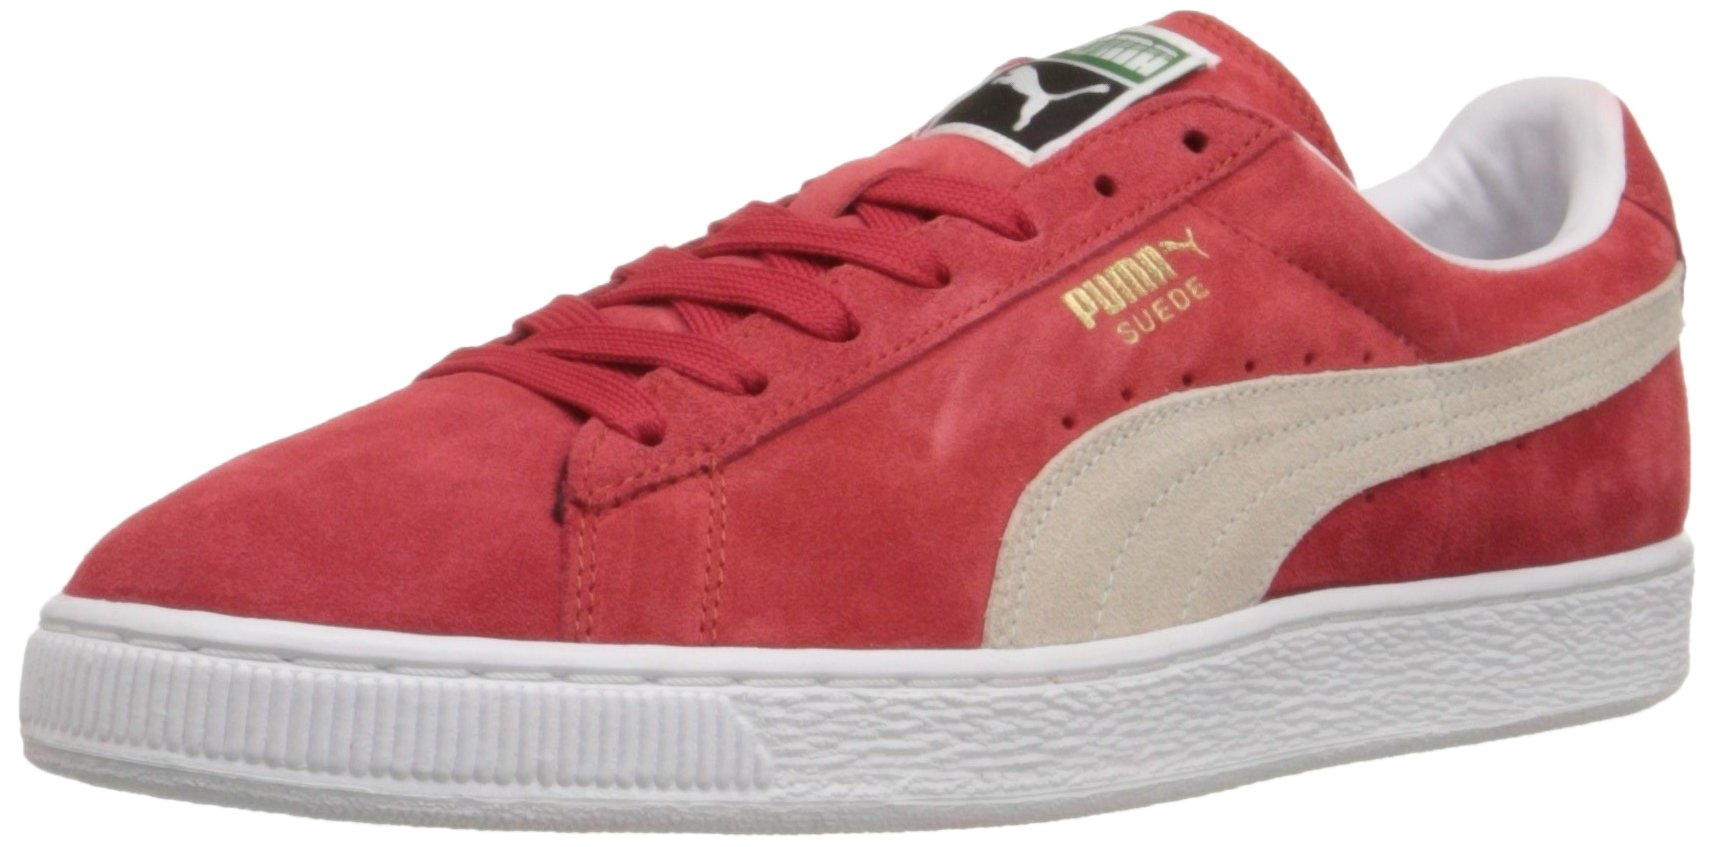 PUMA Suede Classic Sneaker,High Risk Red/White,9.5 M US Men's